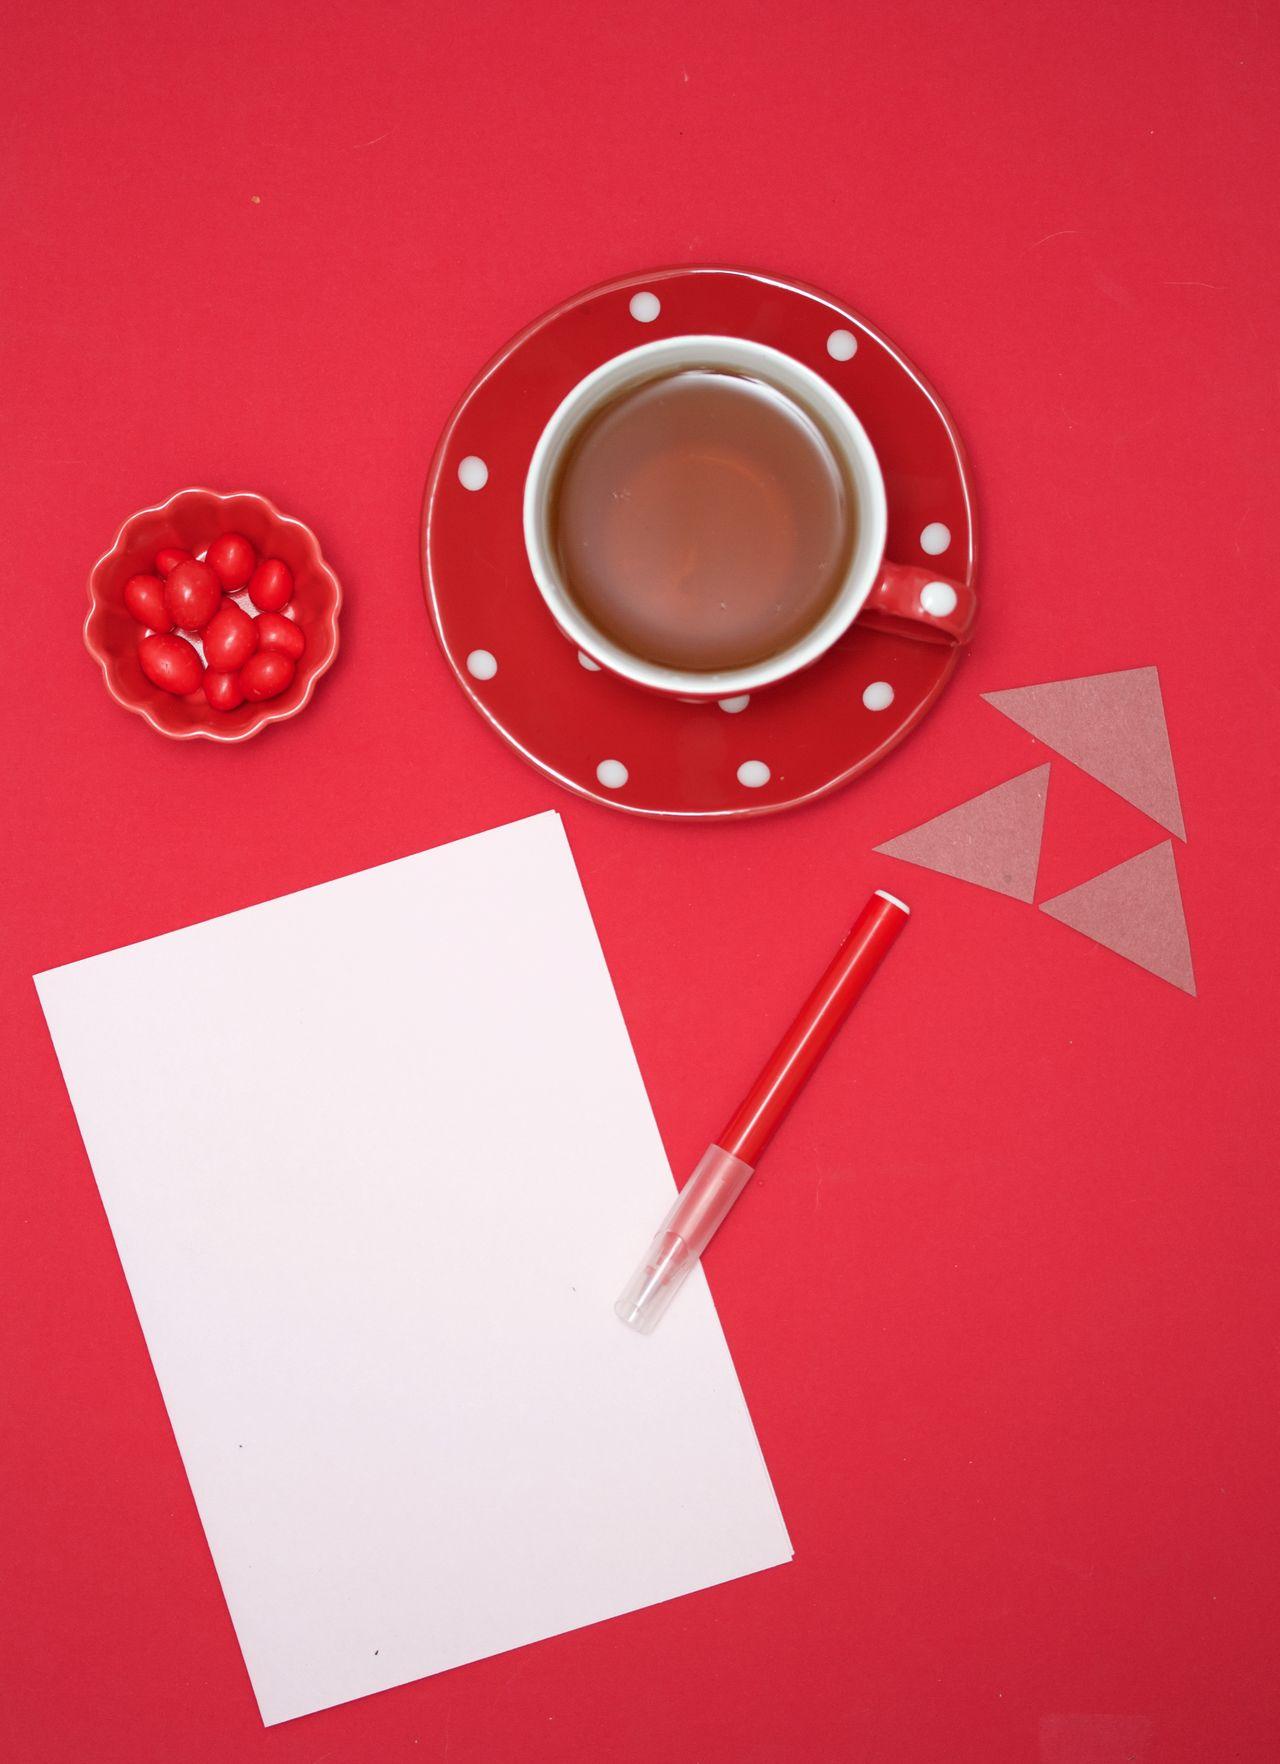 red desktop Close-up Desktop Drink Indoors  No People Peanuts Red Red Pen Reminder Table Tea